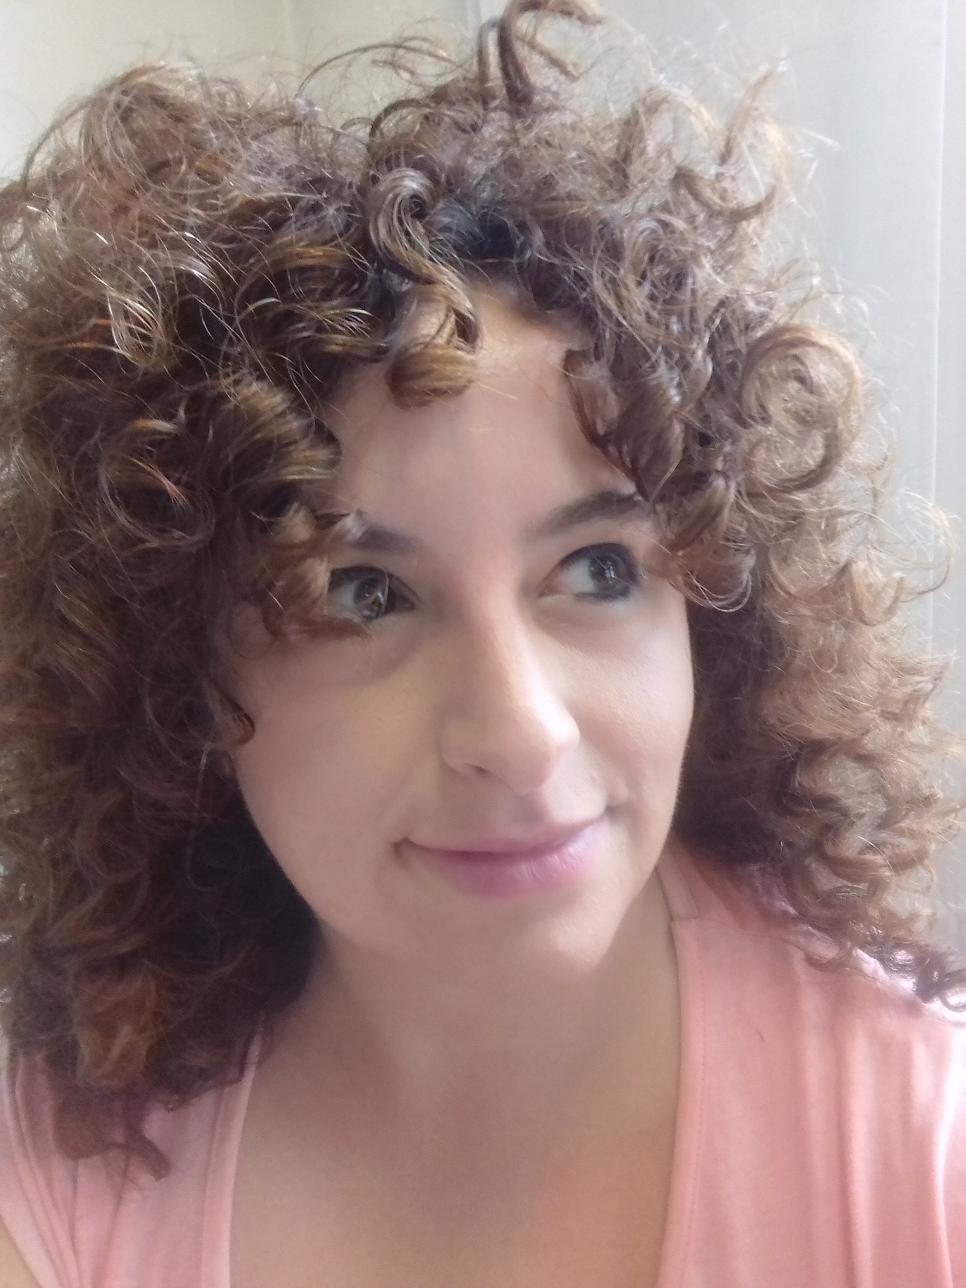 Elisa Colangeli